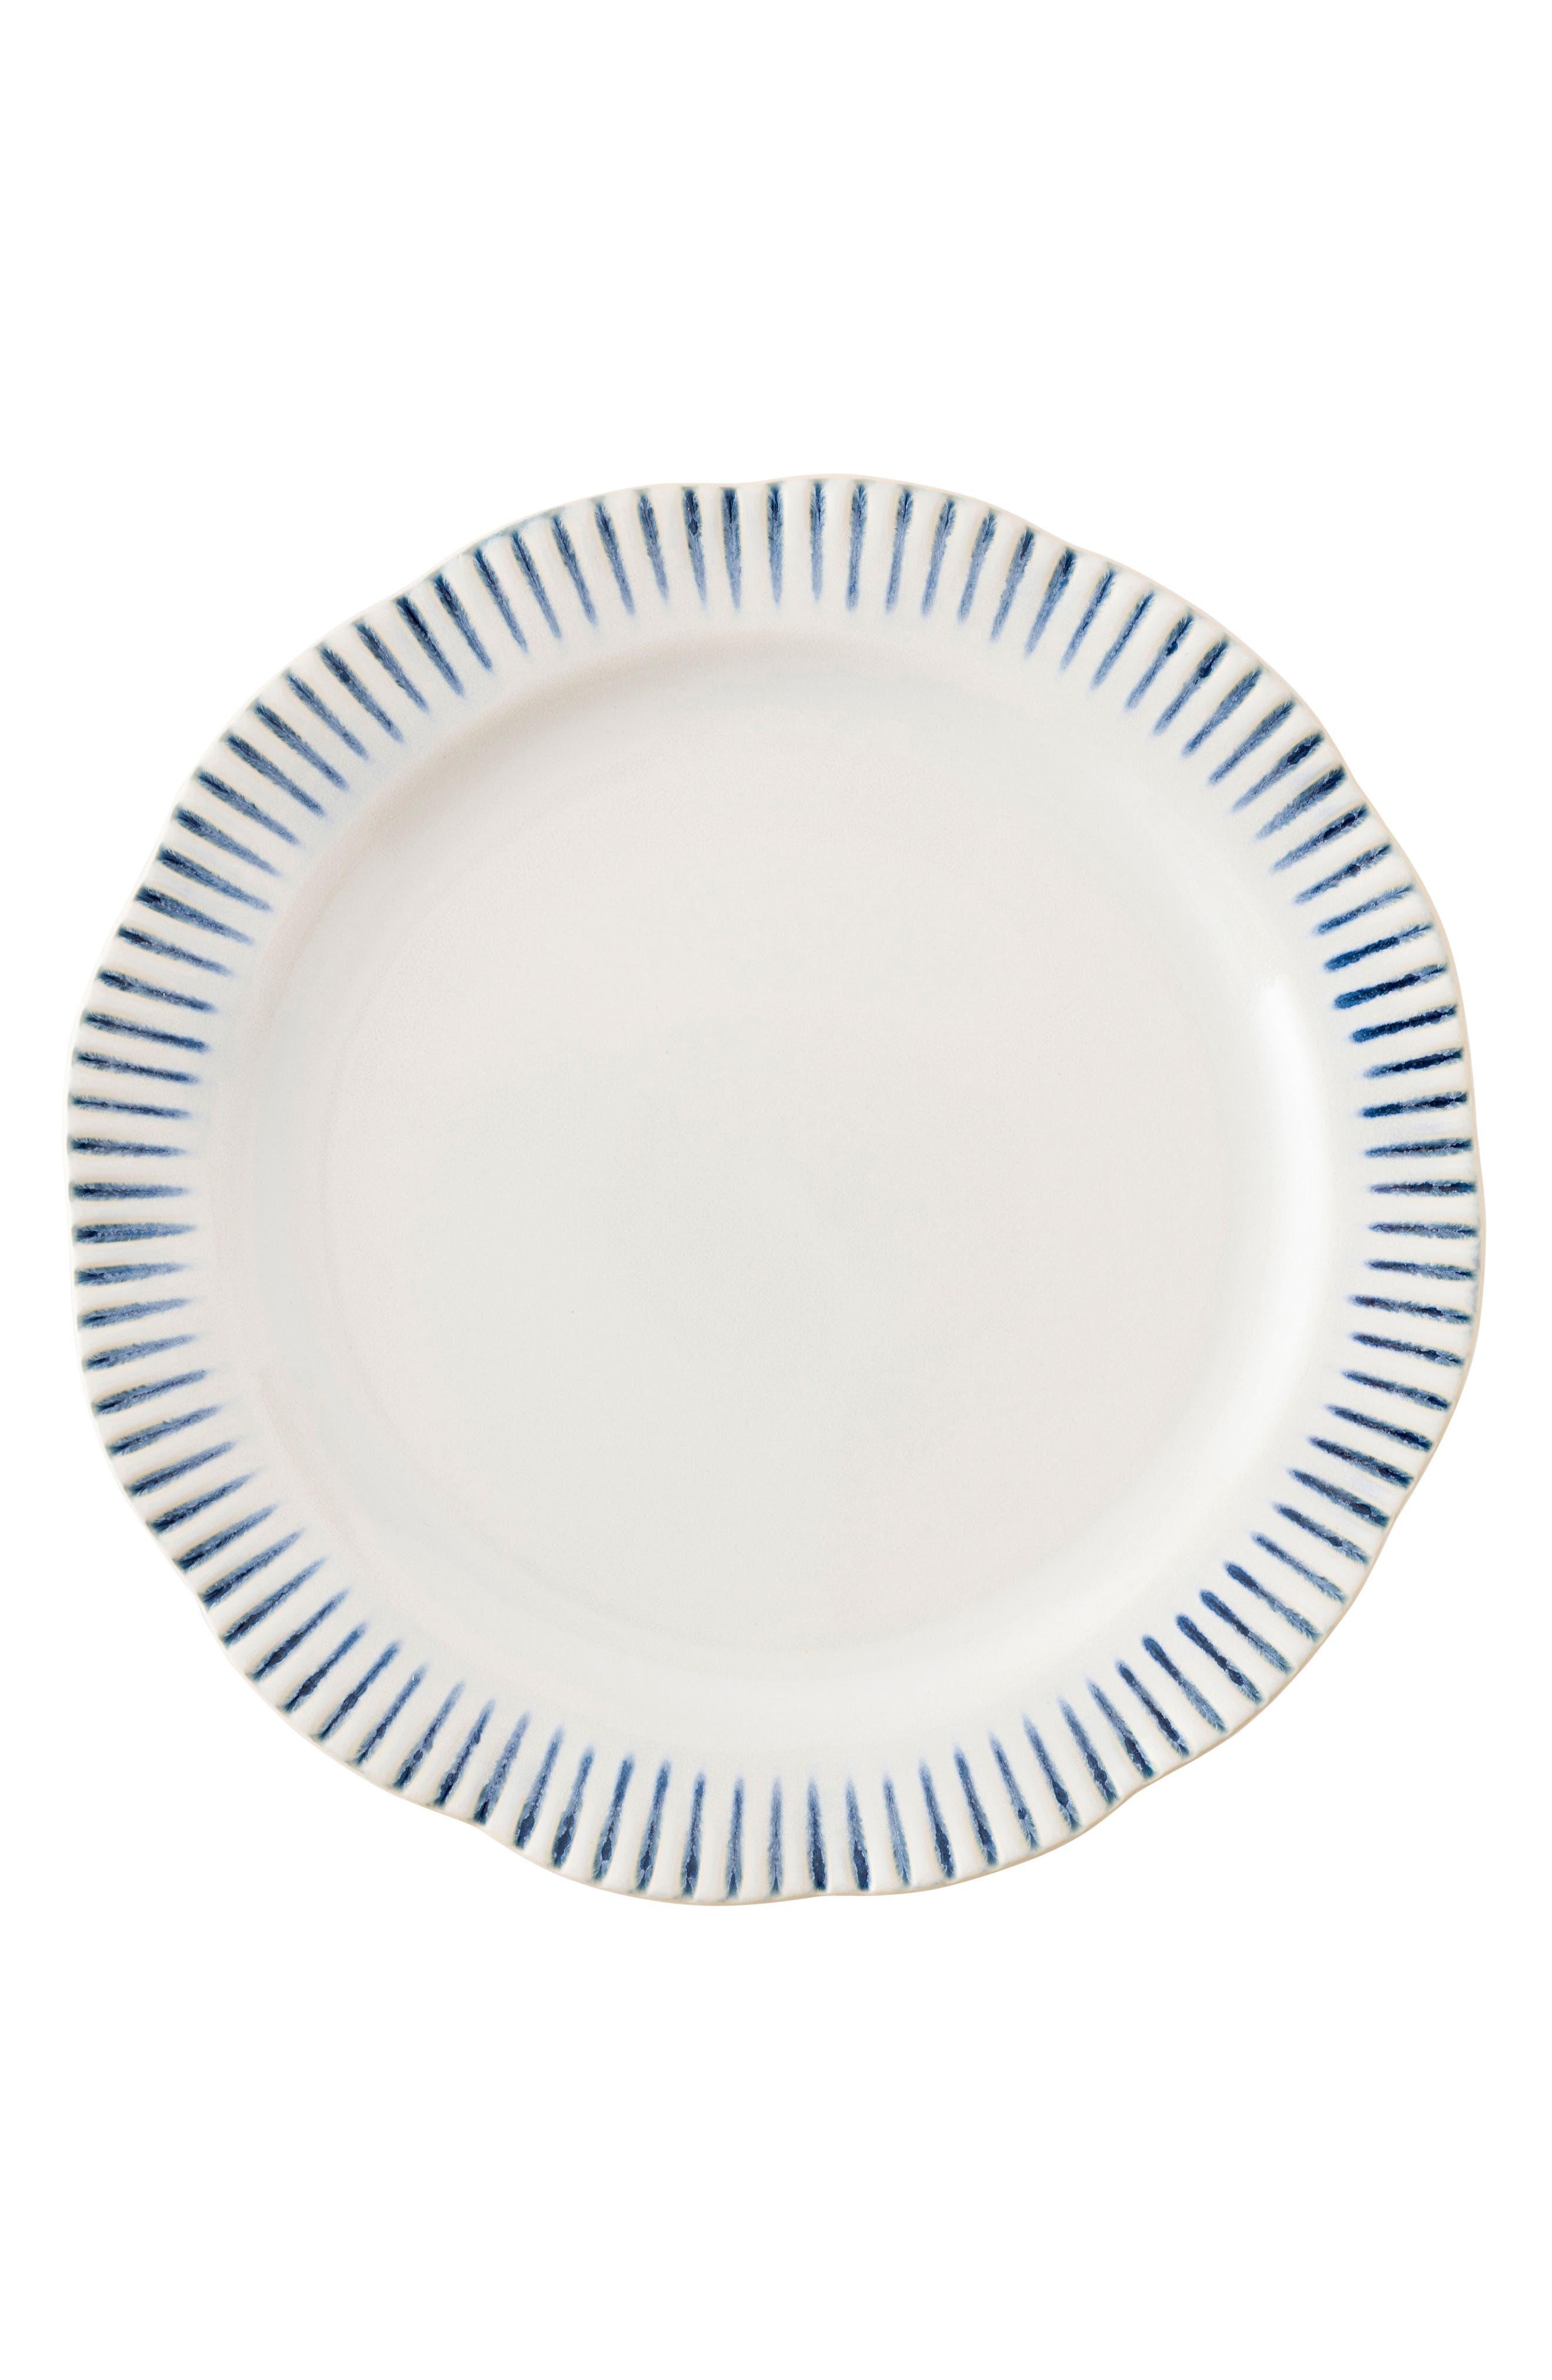 Wanderlust Collection - Sitio Stripe Stoneware Dinner Plate,                         Main,                         color, INDIGO